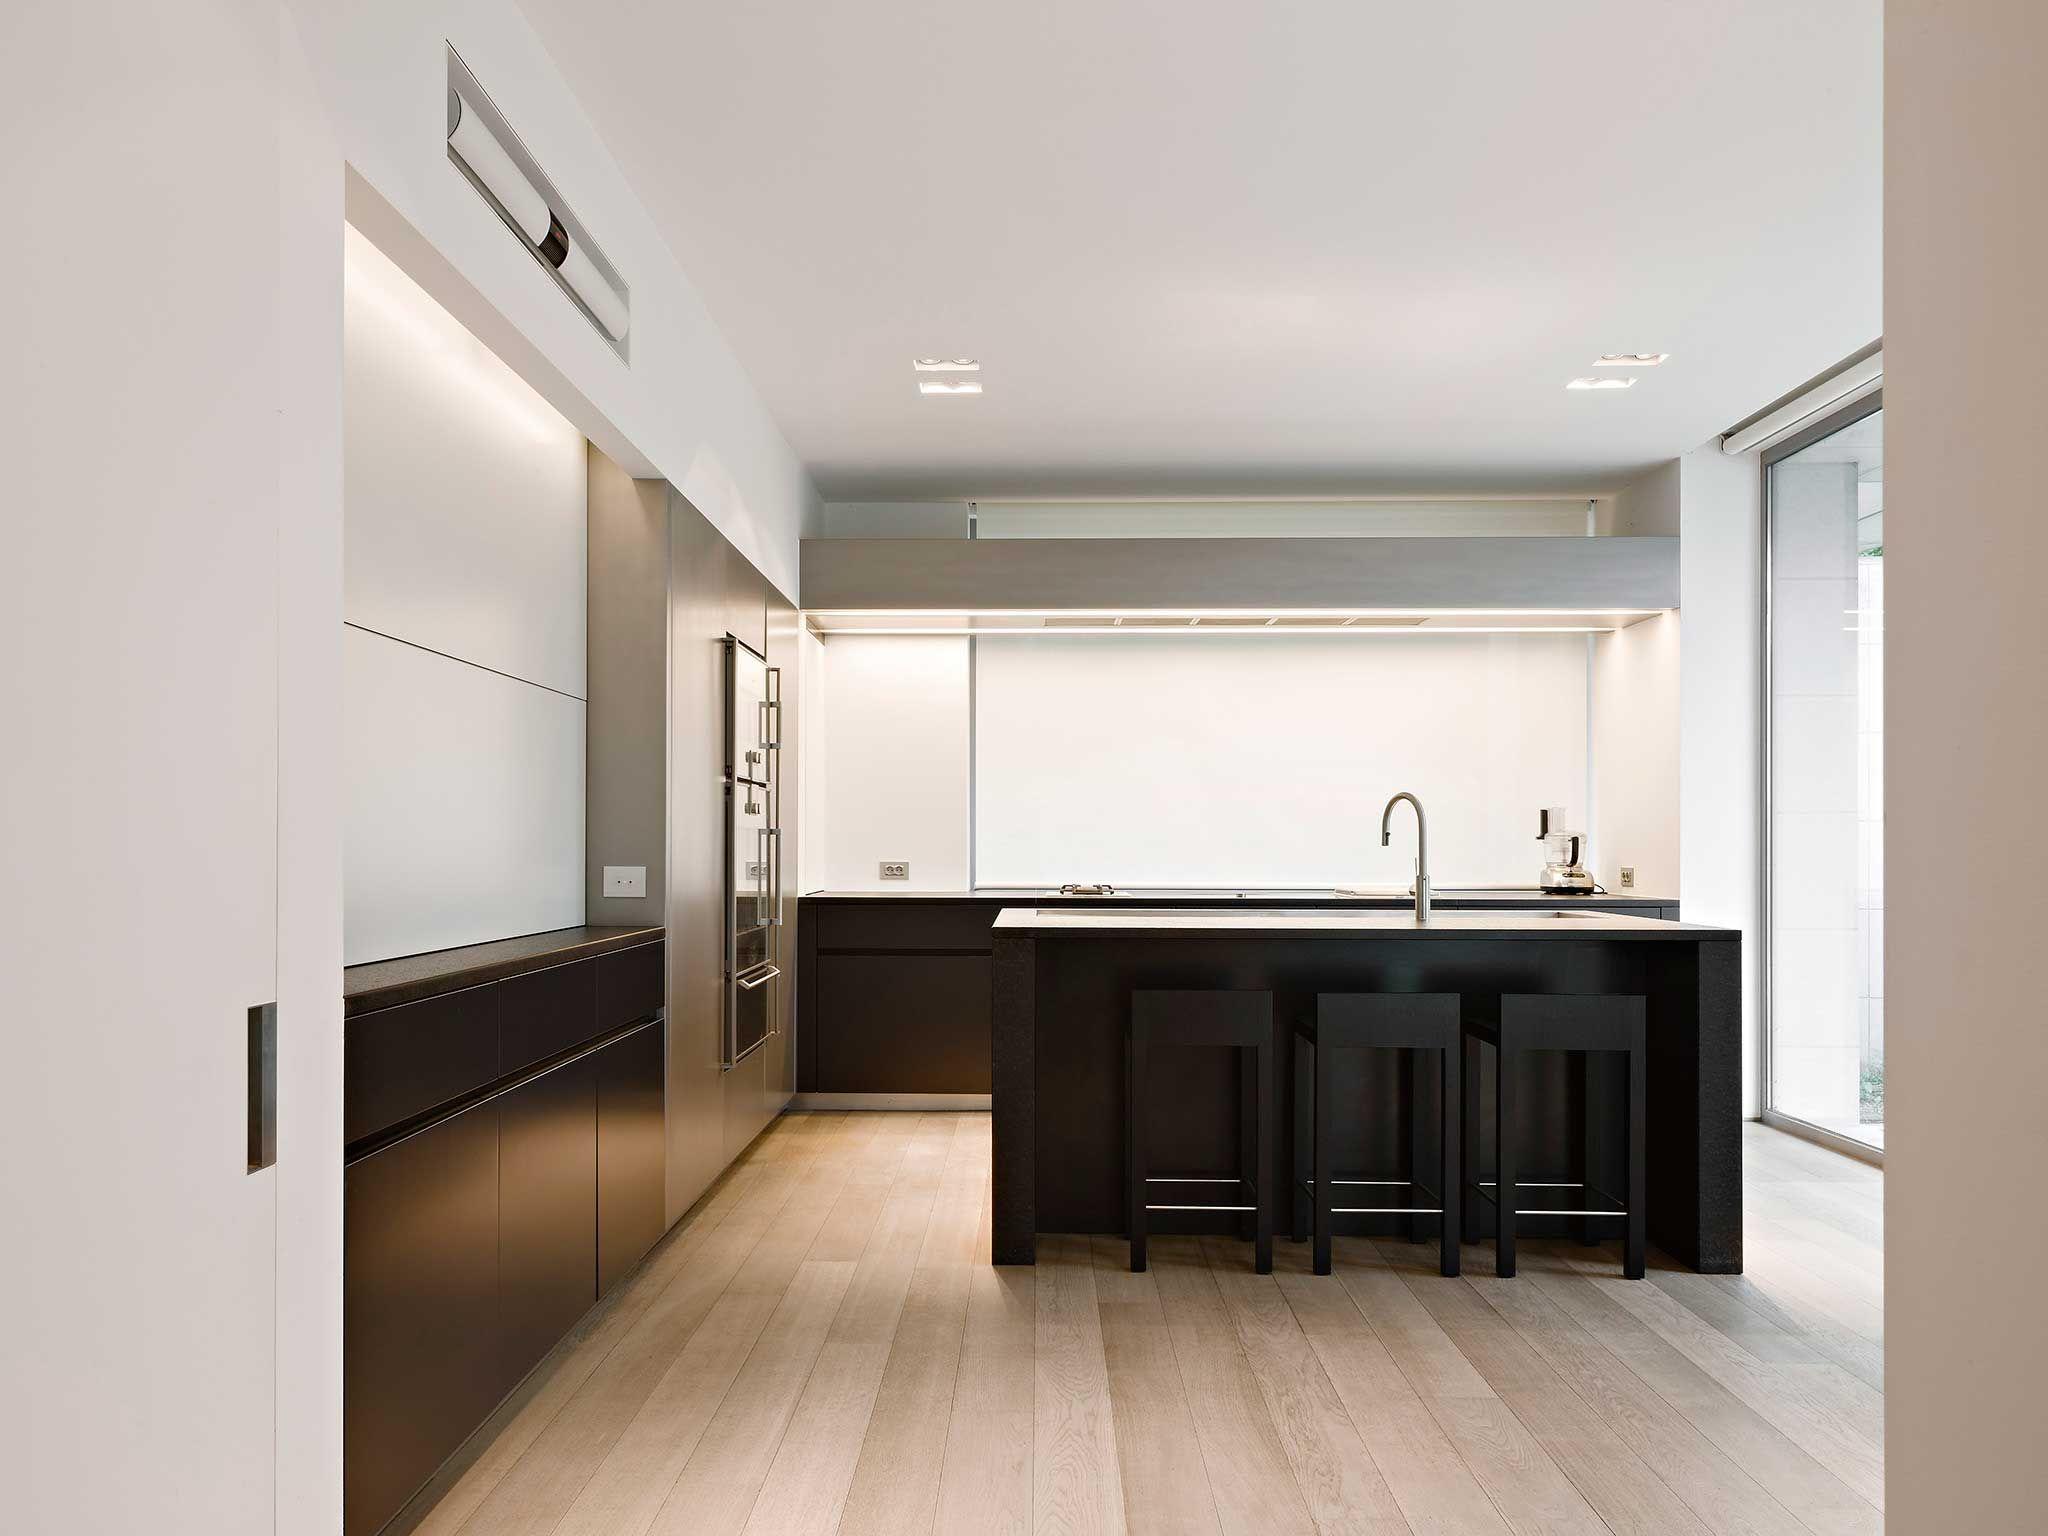 obumex | professional kitchen | windows | design | sergio herman ... - Designer Chefmobel Moderne Buro